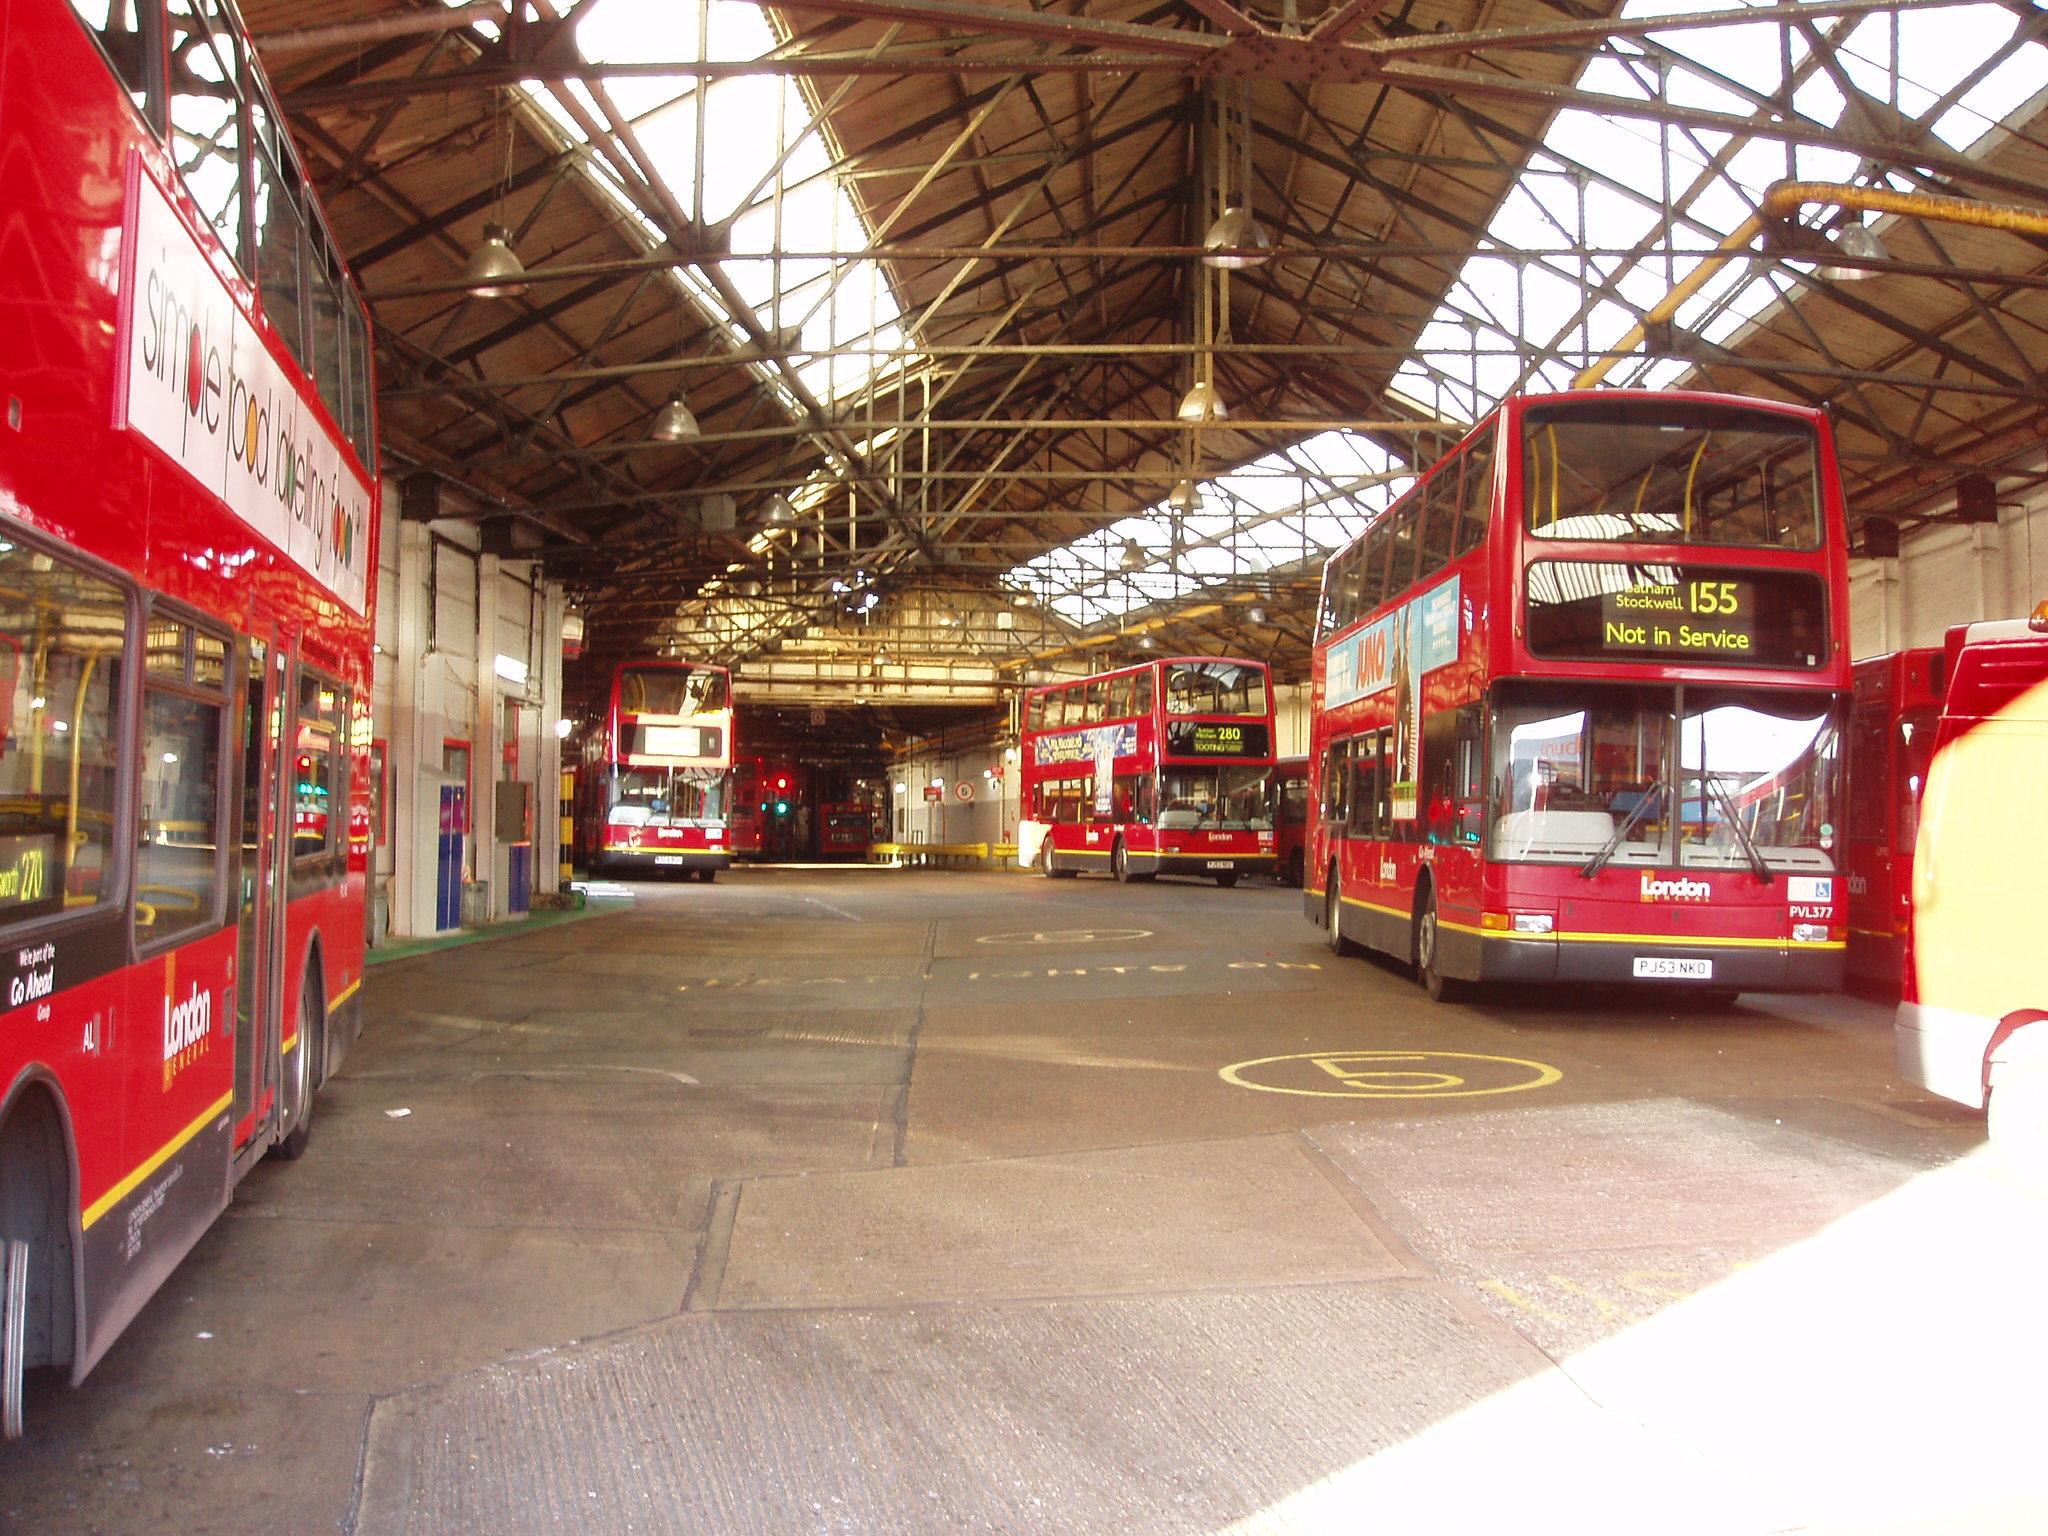 File:Merton Bus Garage.jpg - Wikimedia Commons